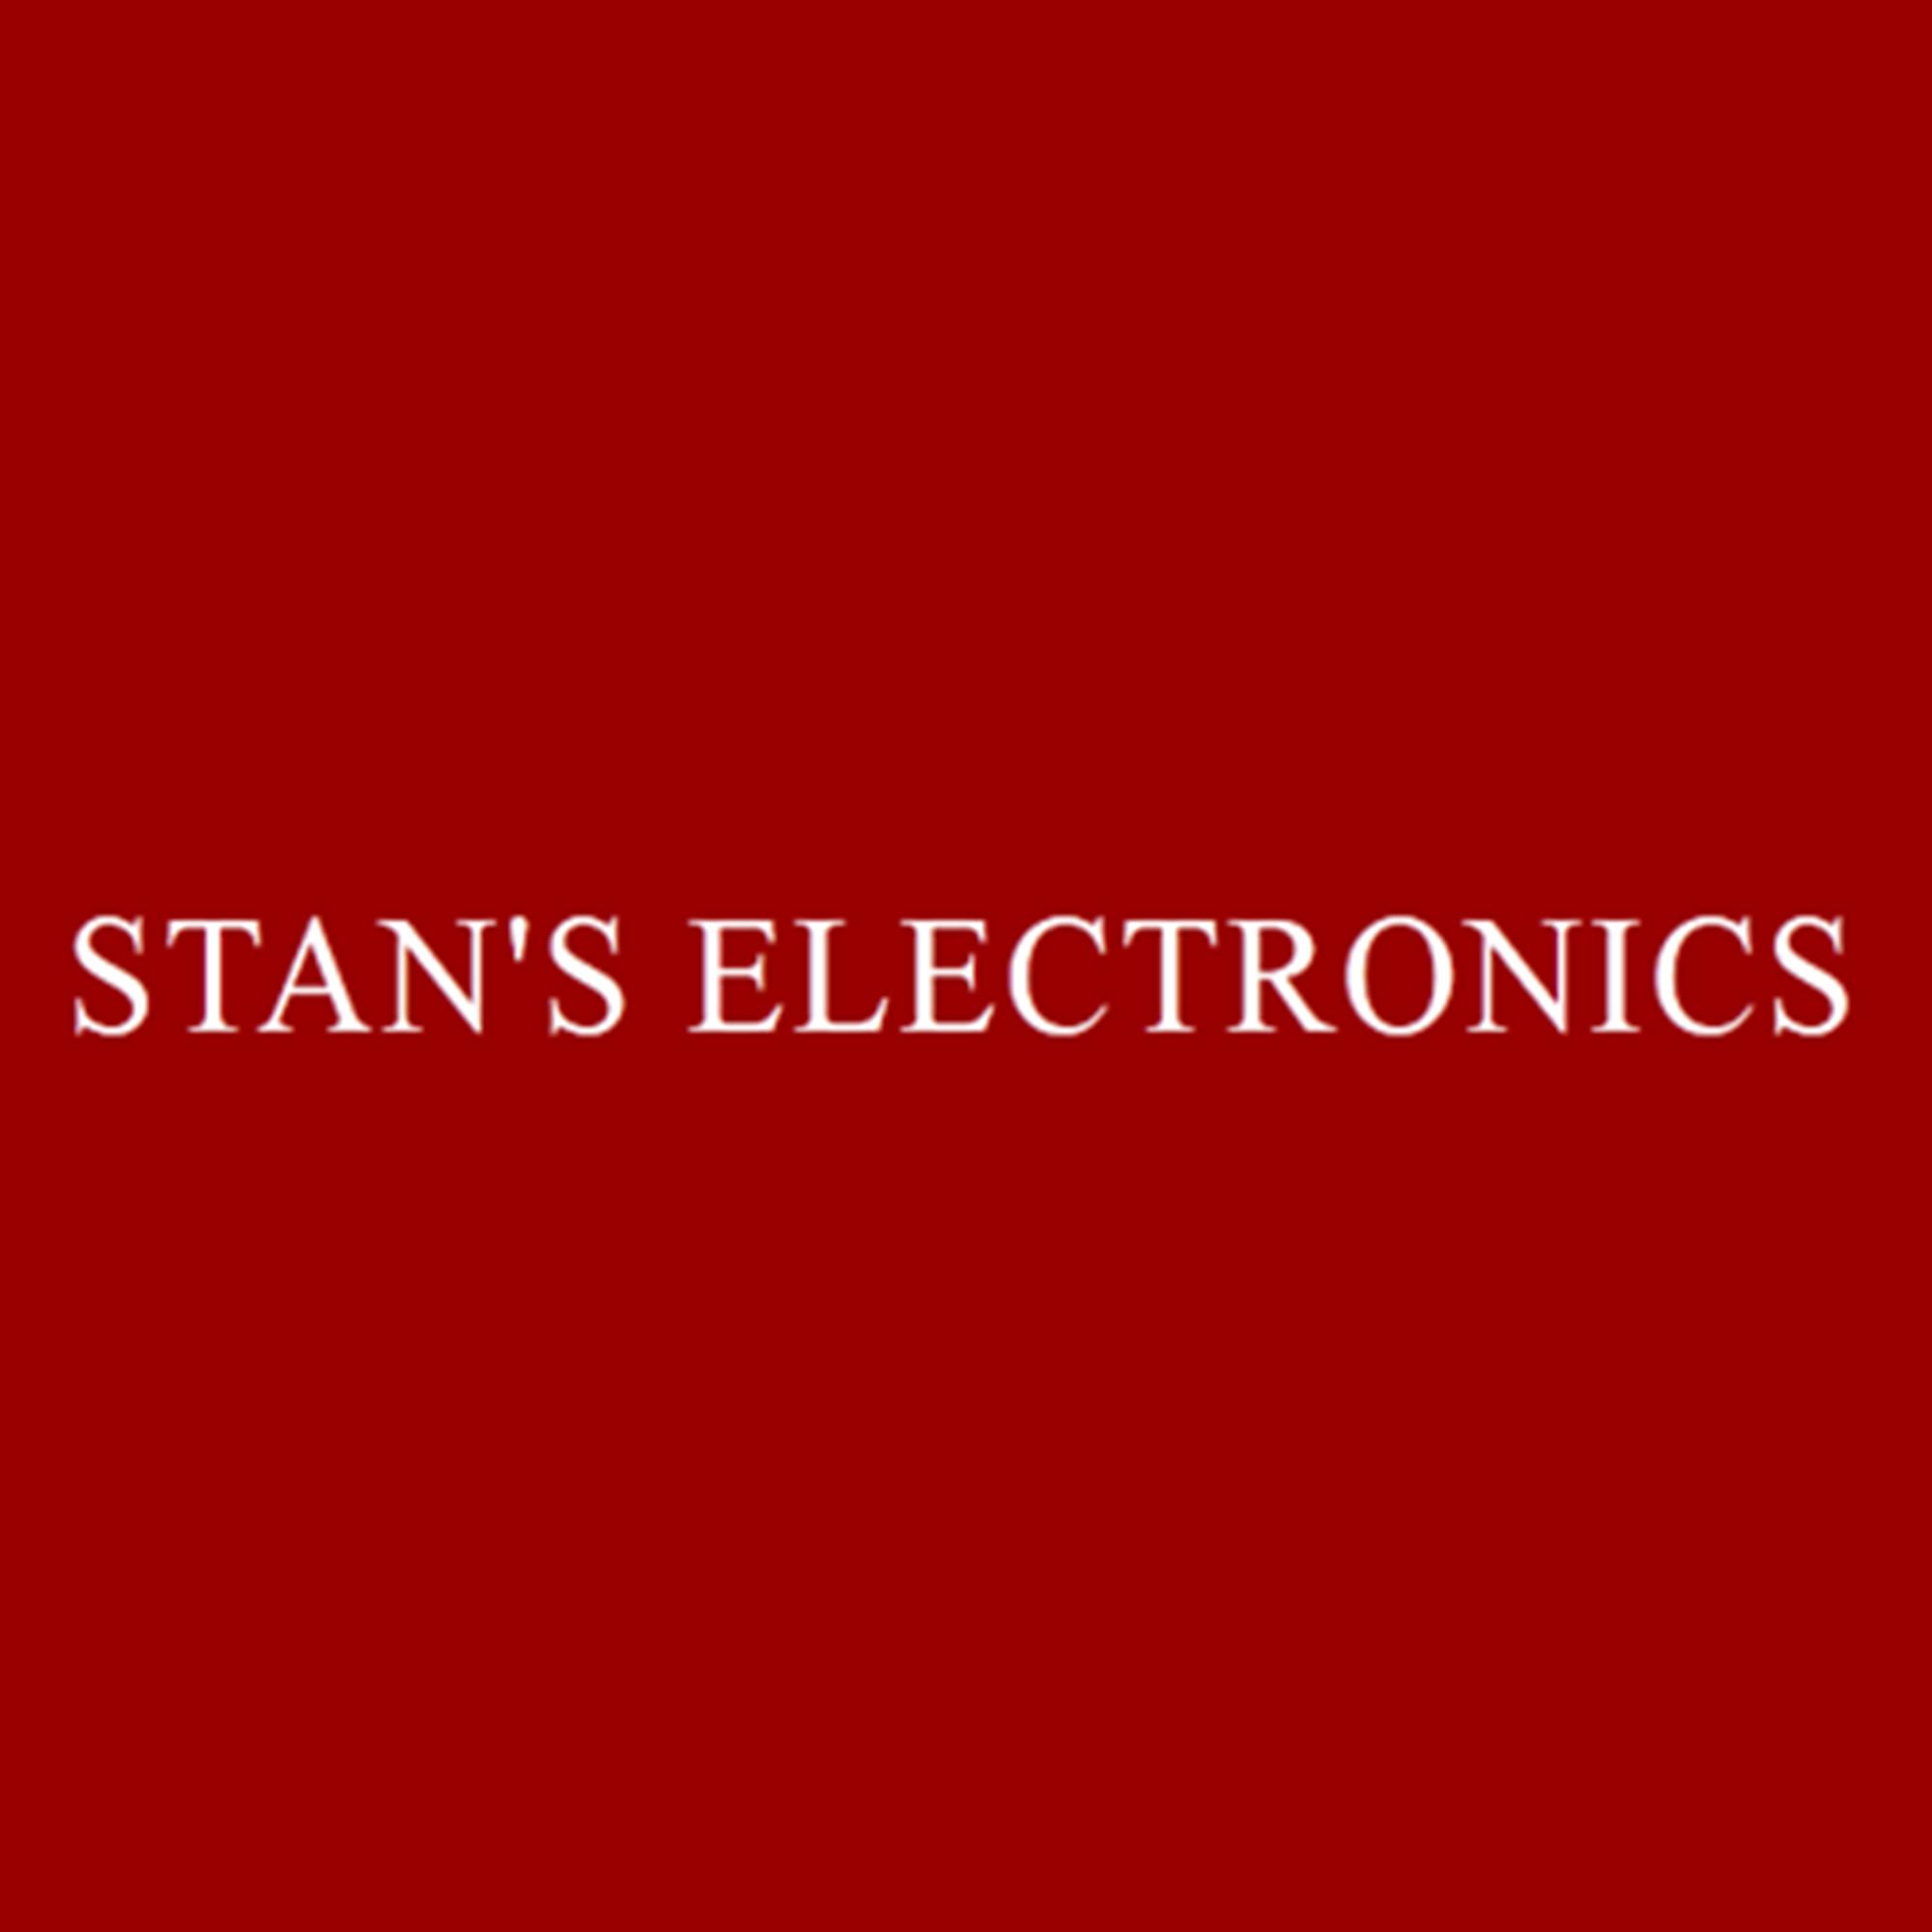 Stan's Electronics,